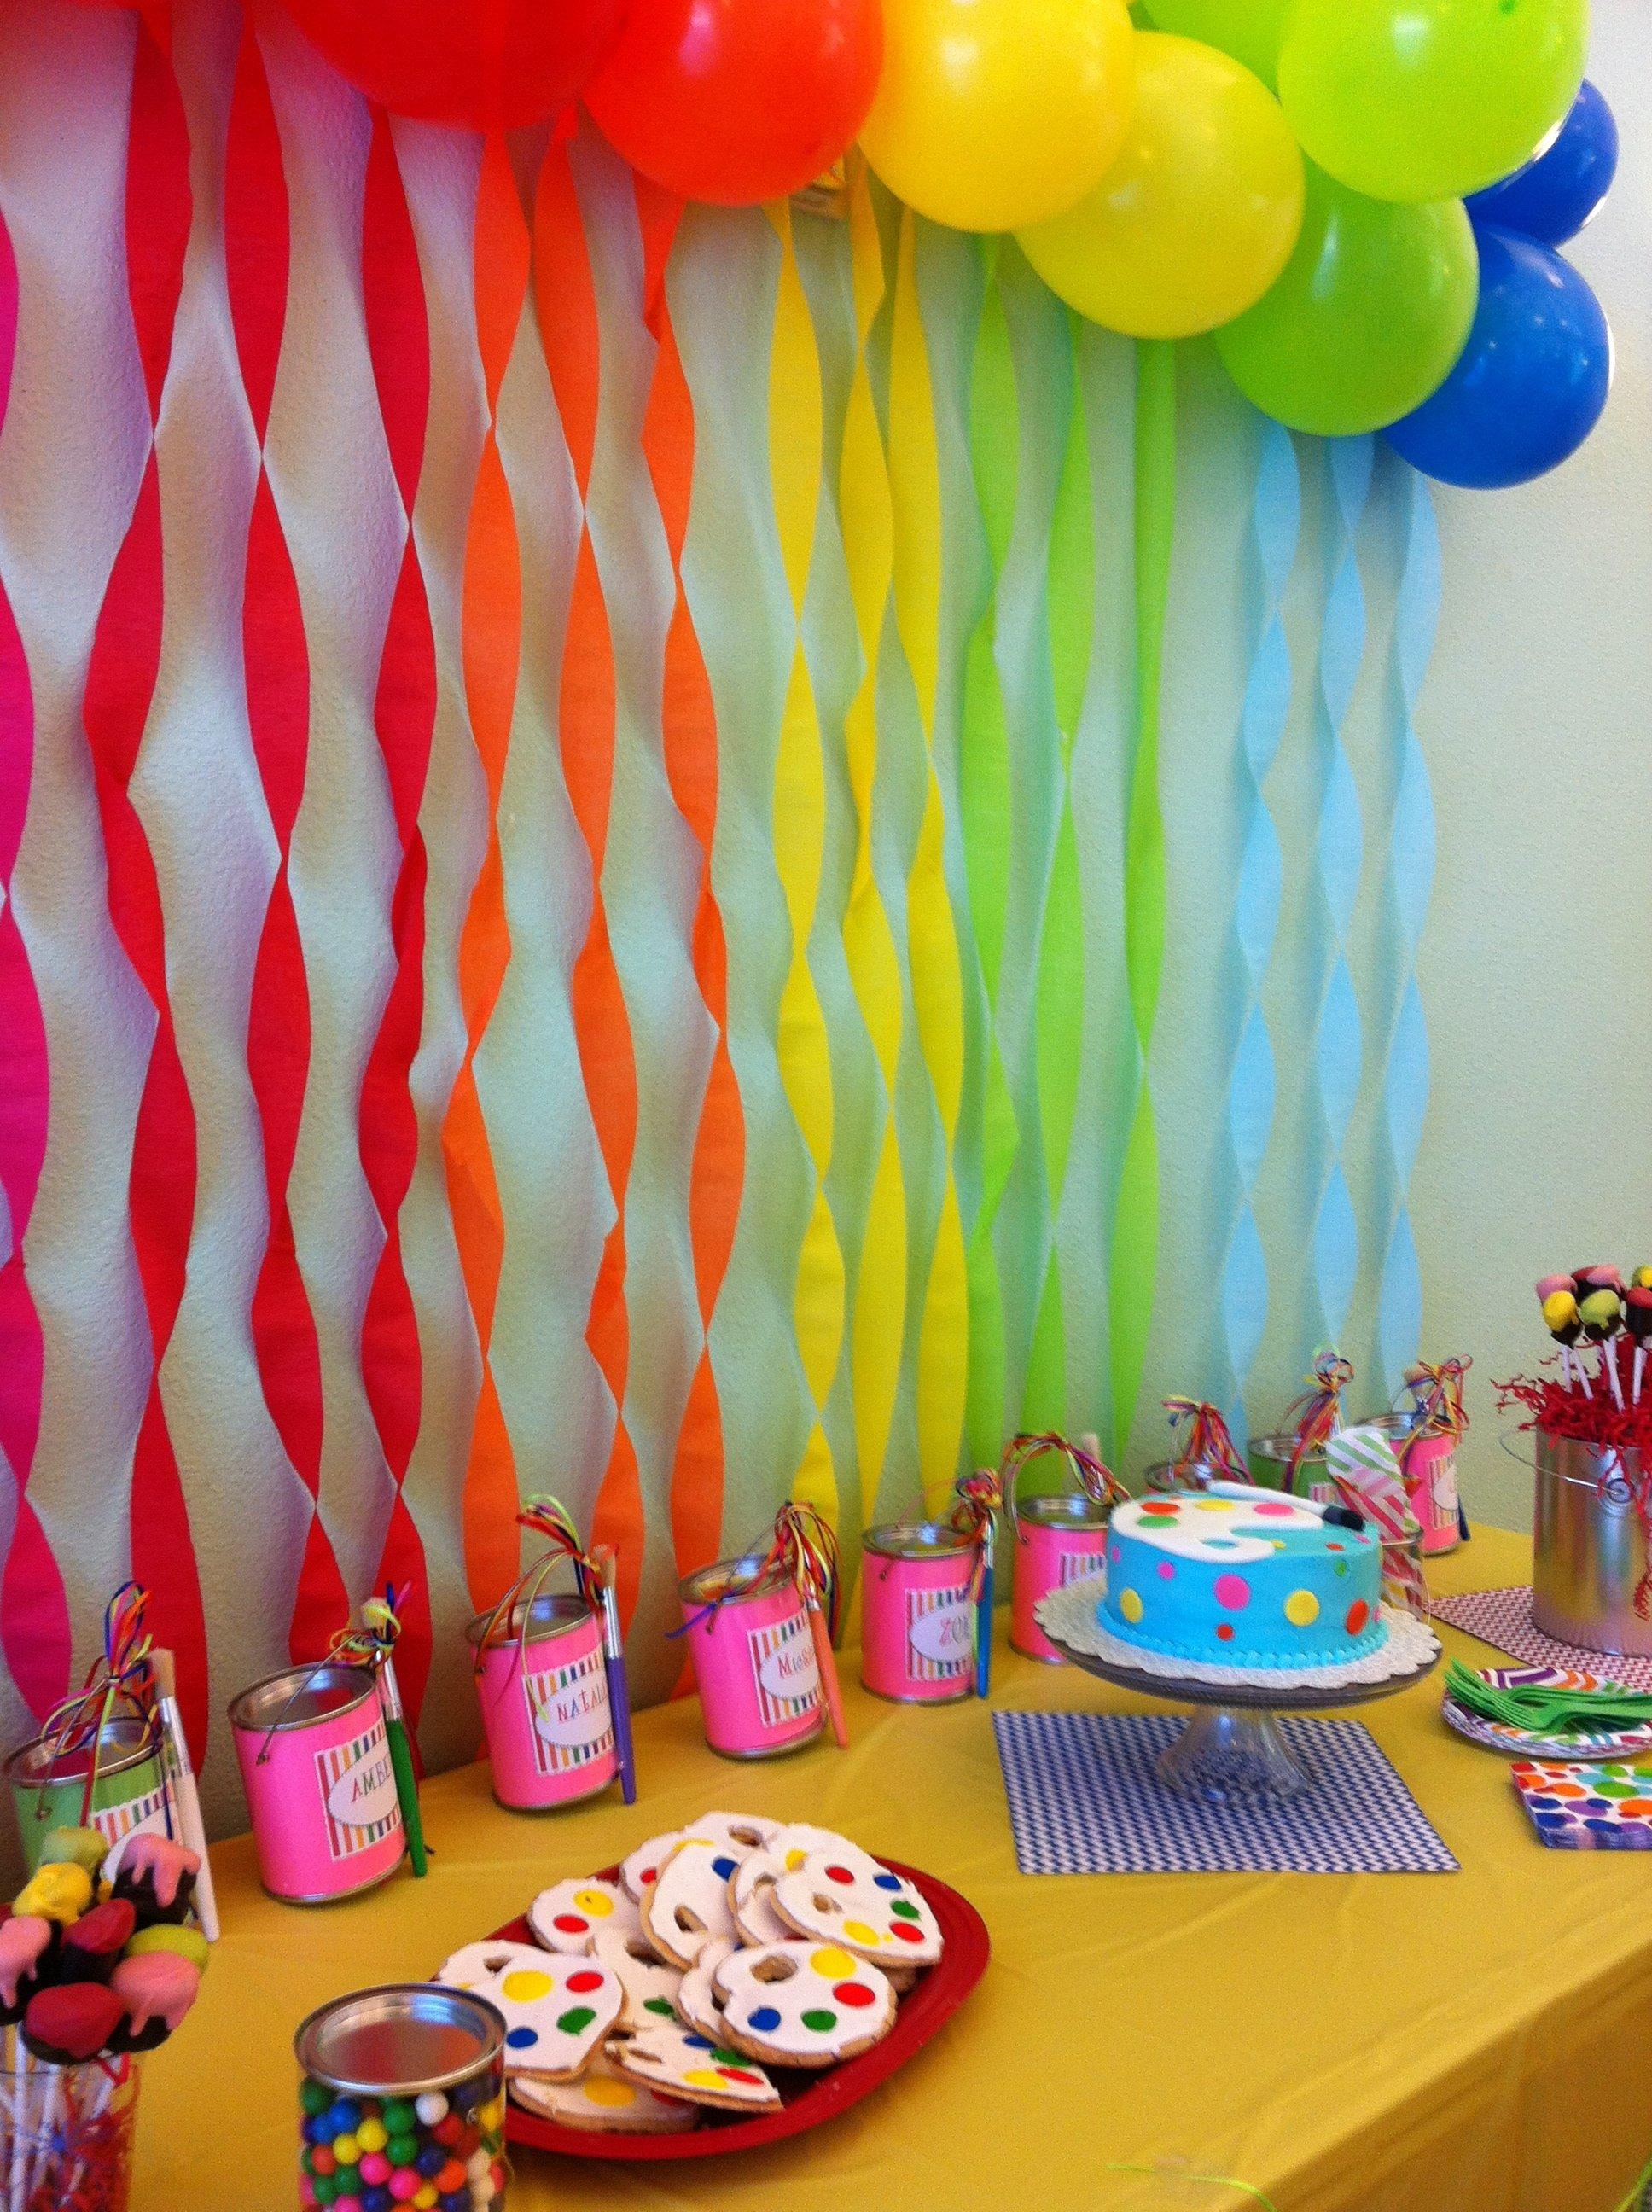 10 Lovely 1 Year Old Birthday Ideas